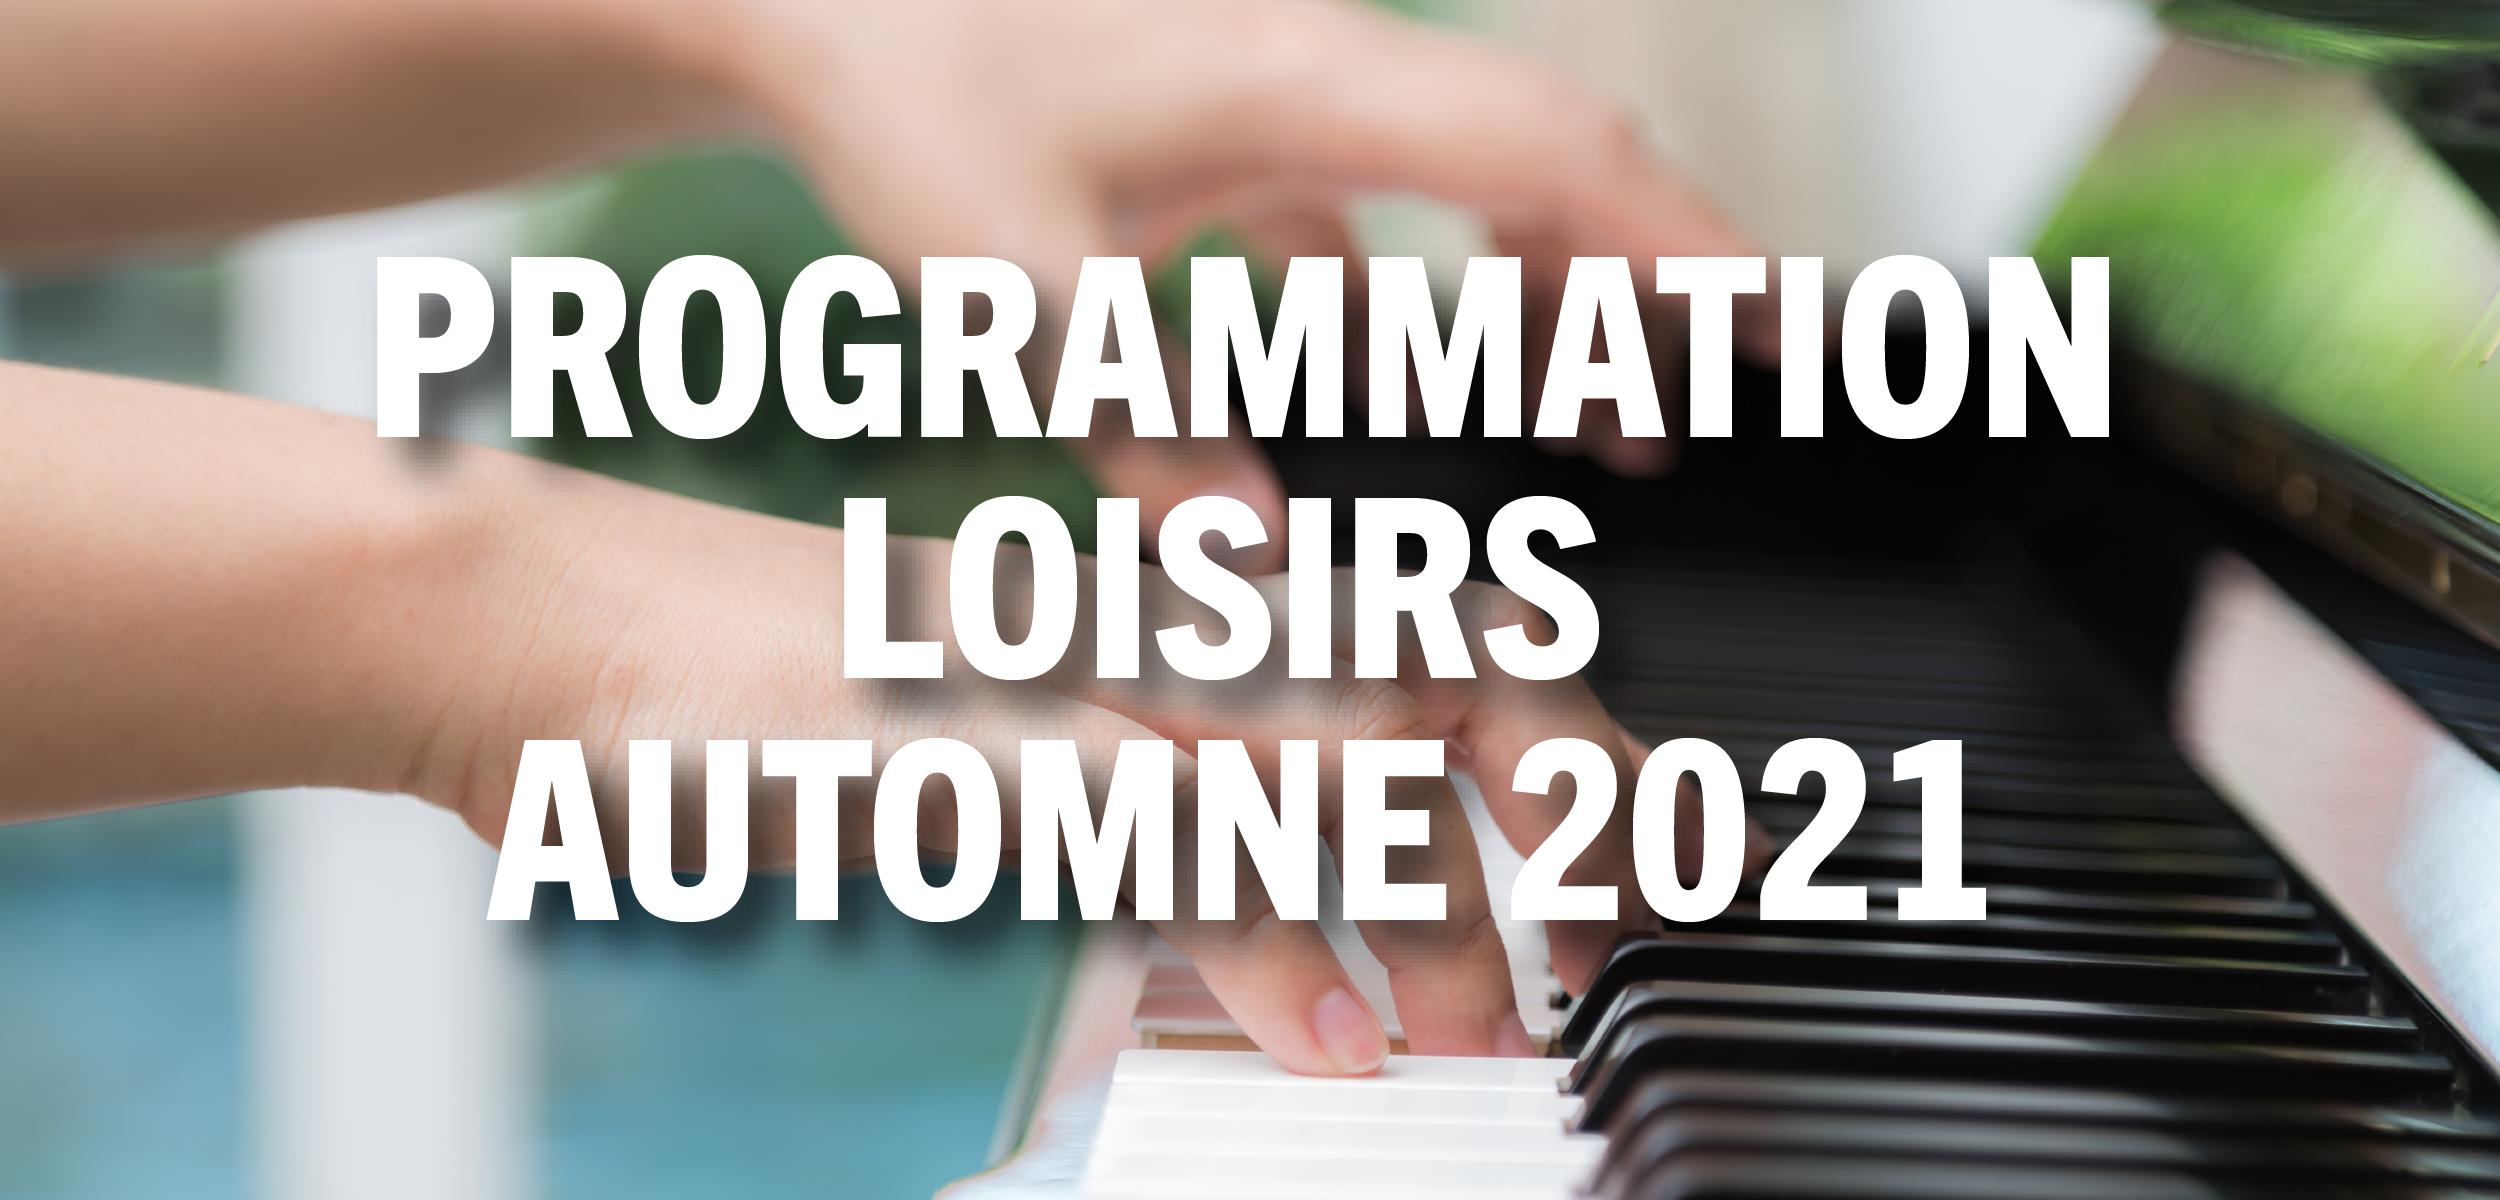 Programmation loisirs – Automne 2021